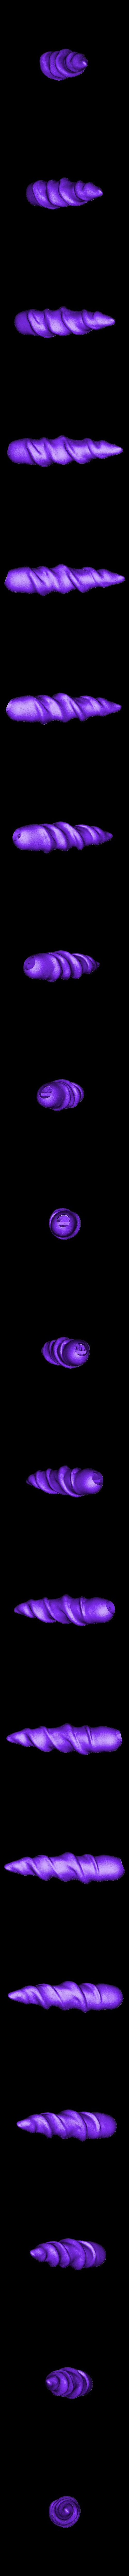 Unicorn_Horn.obj Download free OBJ file Unicorn Night Light • 3D printable design, Pza4Rza